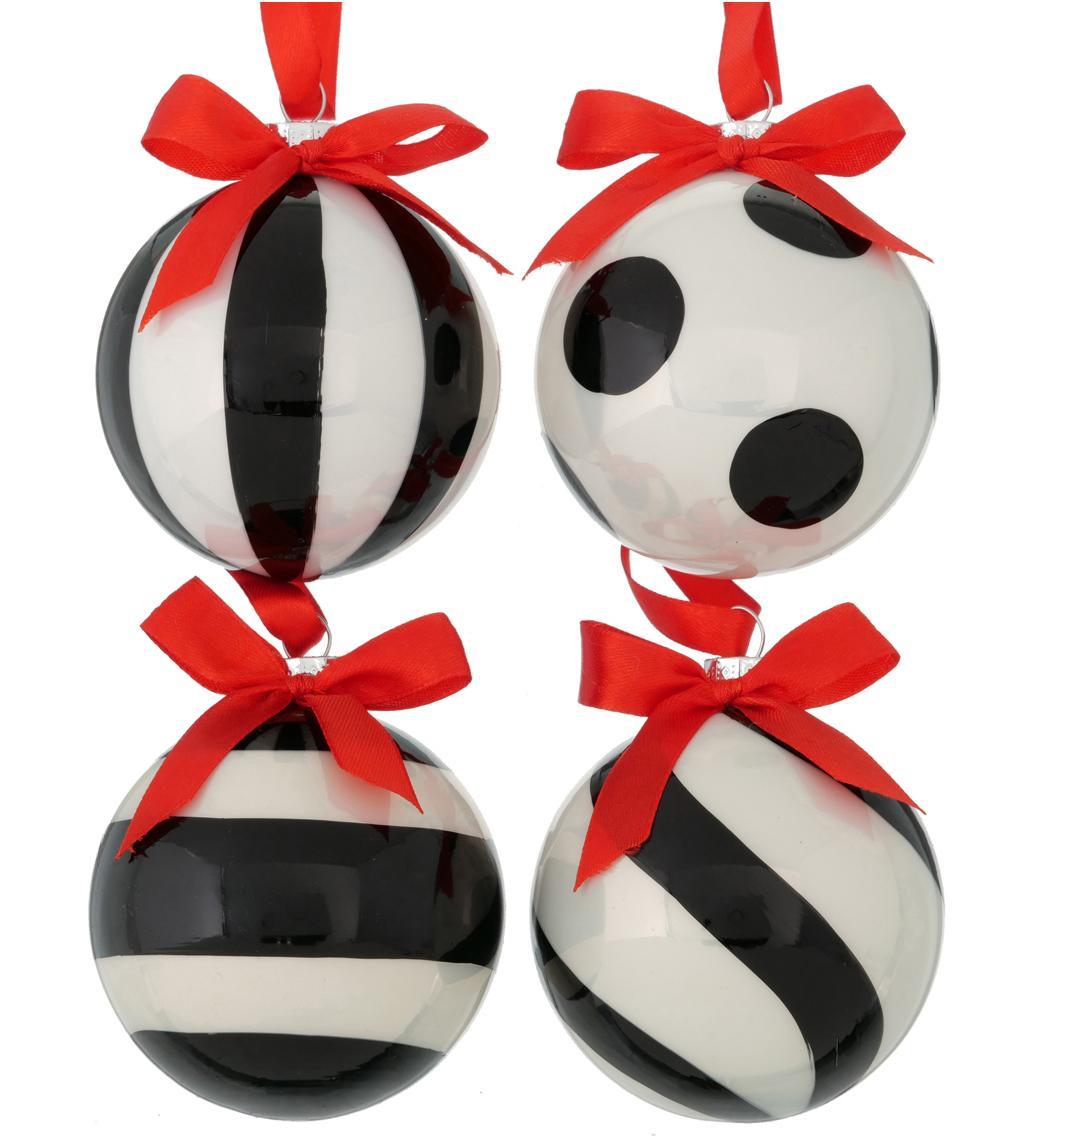 Set de bolas de Navidad Geoma, 4pzas., Negro, blanco, rojo, Ø 8 cm